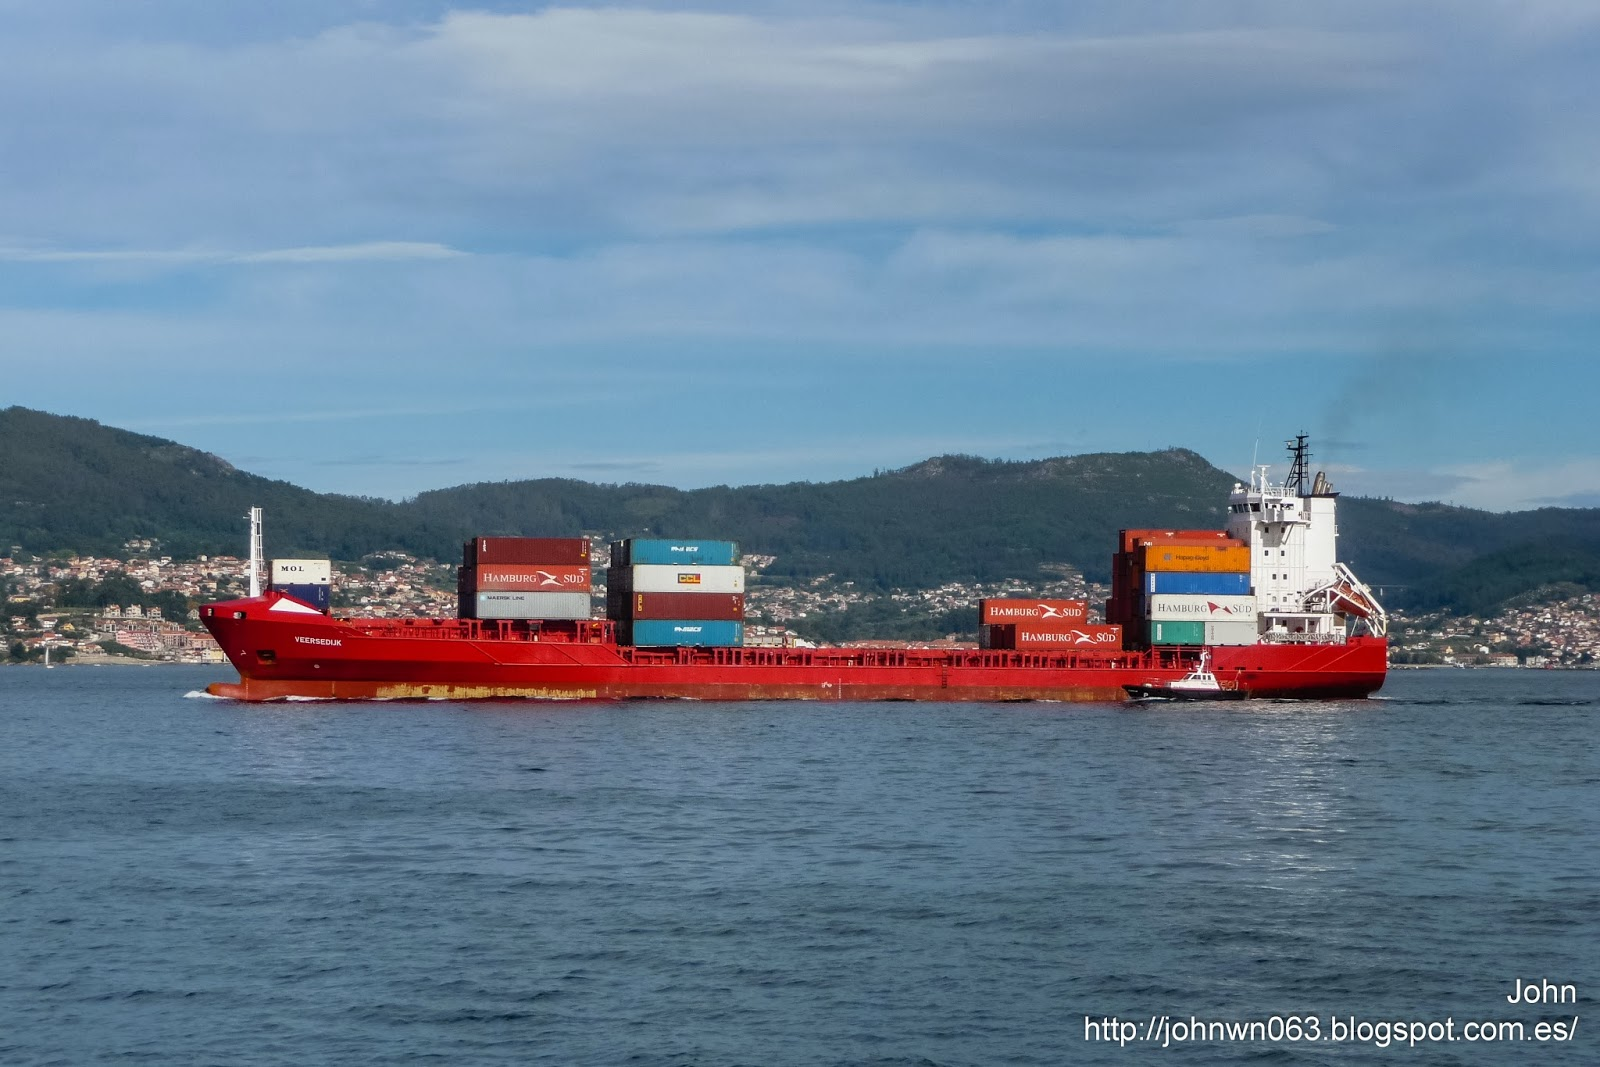 veersedijk, fotos de barcos, container ship, portacontenedores